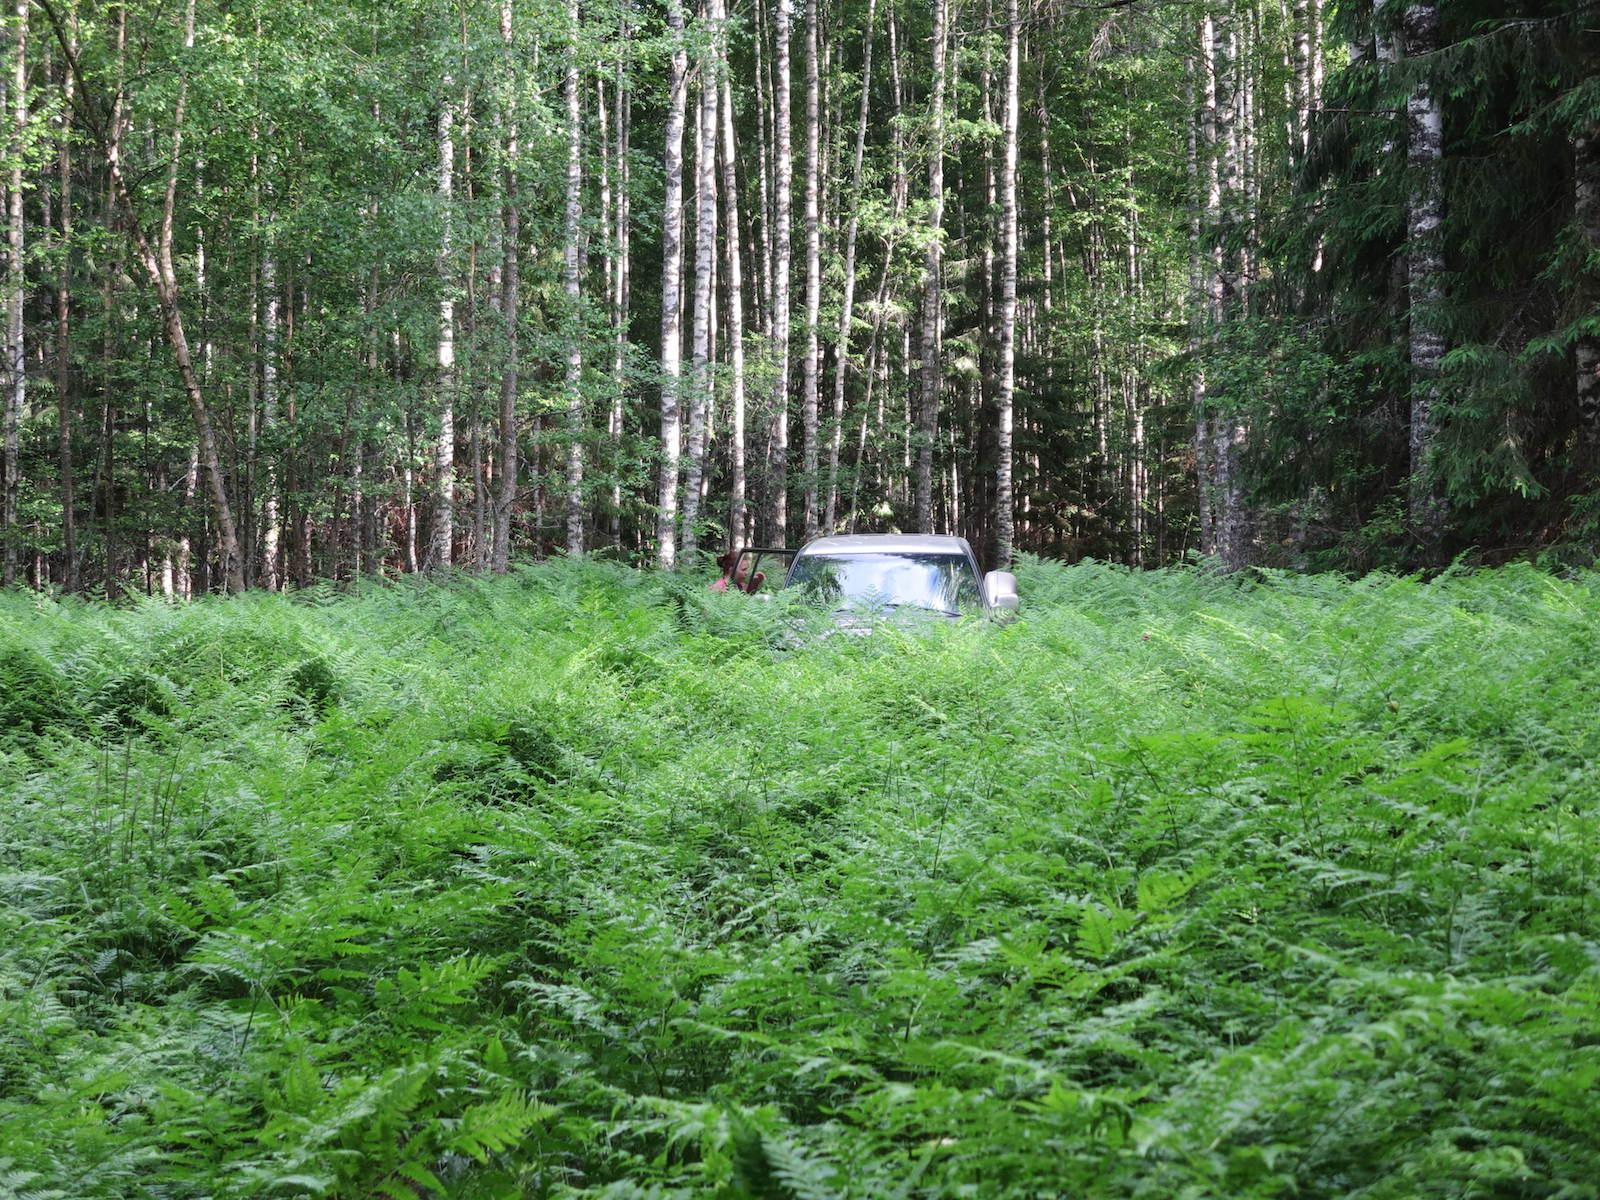 Fernforest with car Belarus